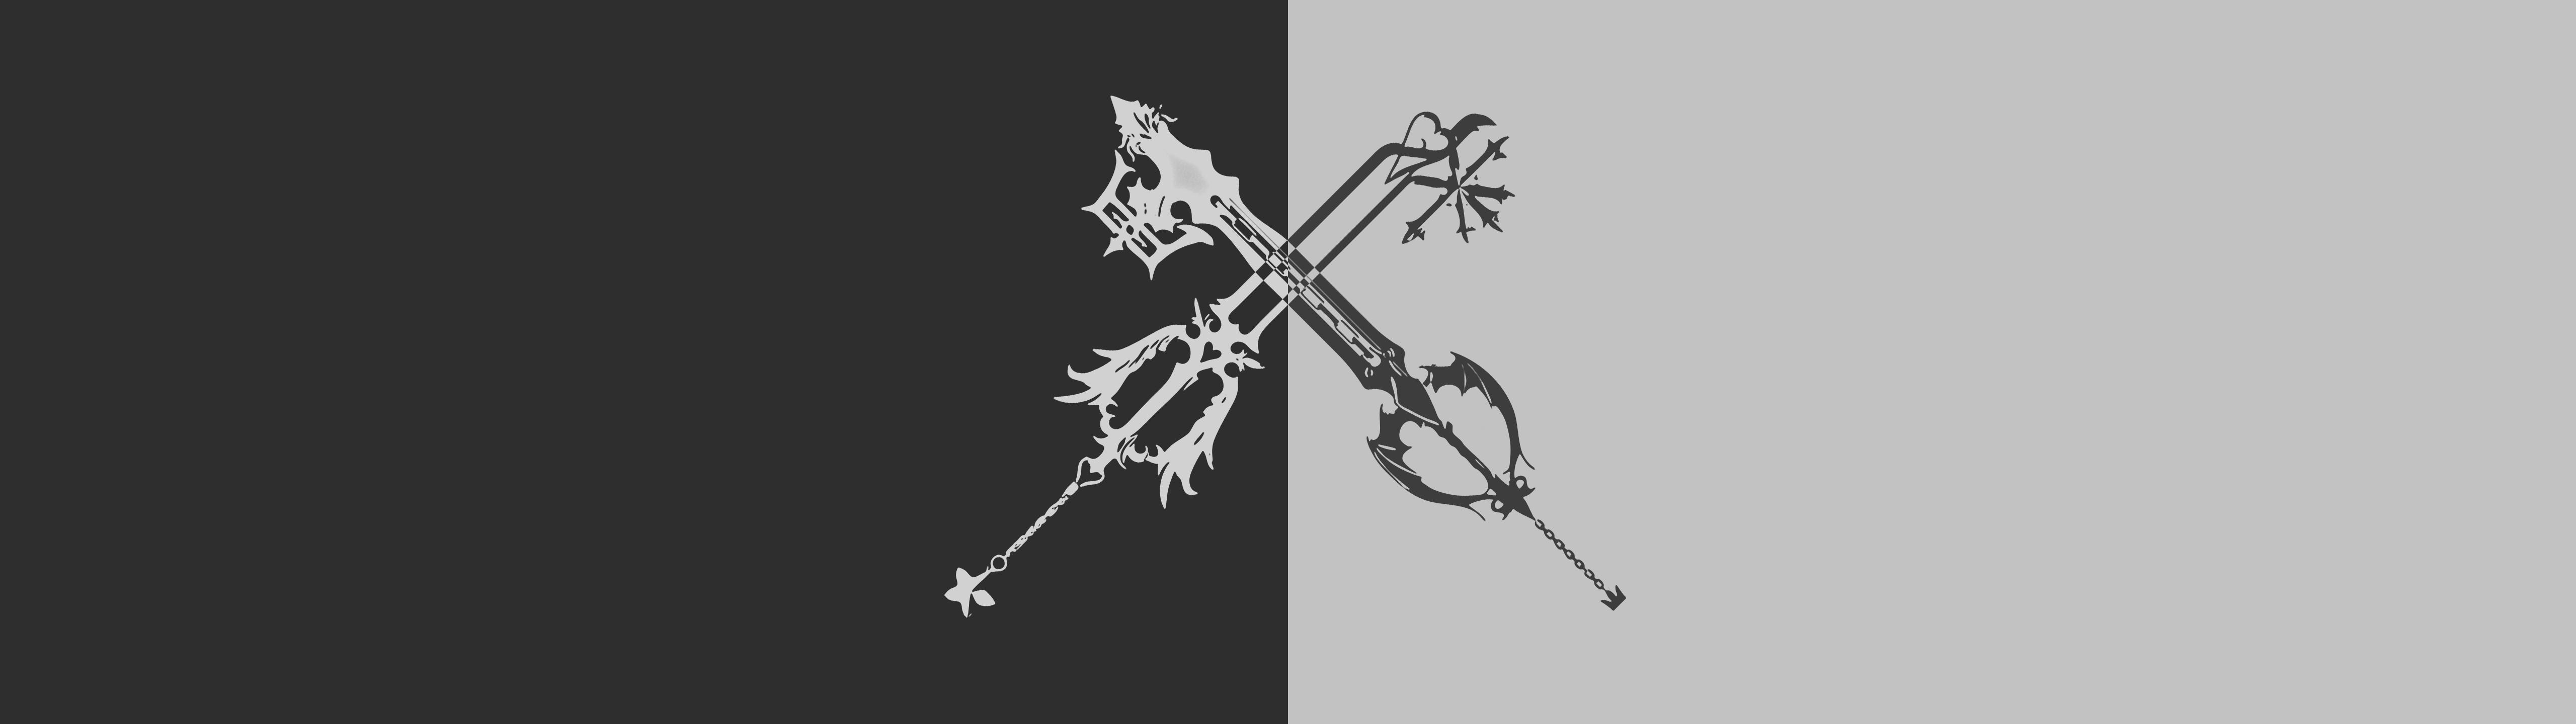 #Kingdom Hearts Oathkeeper/Oblivion wallpaper for single [25601440] & dual monitor [51201440] #Hdwallpaper #wallpaper #image